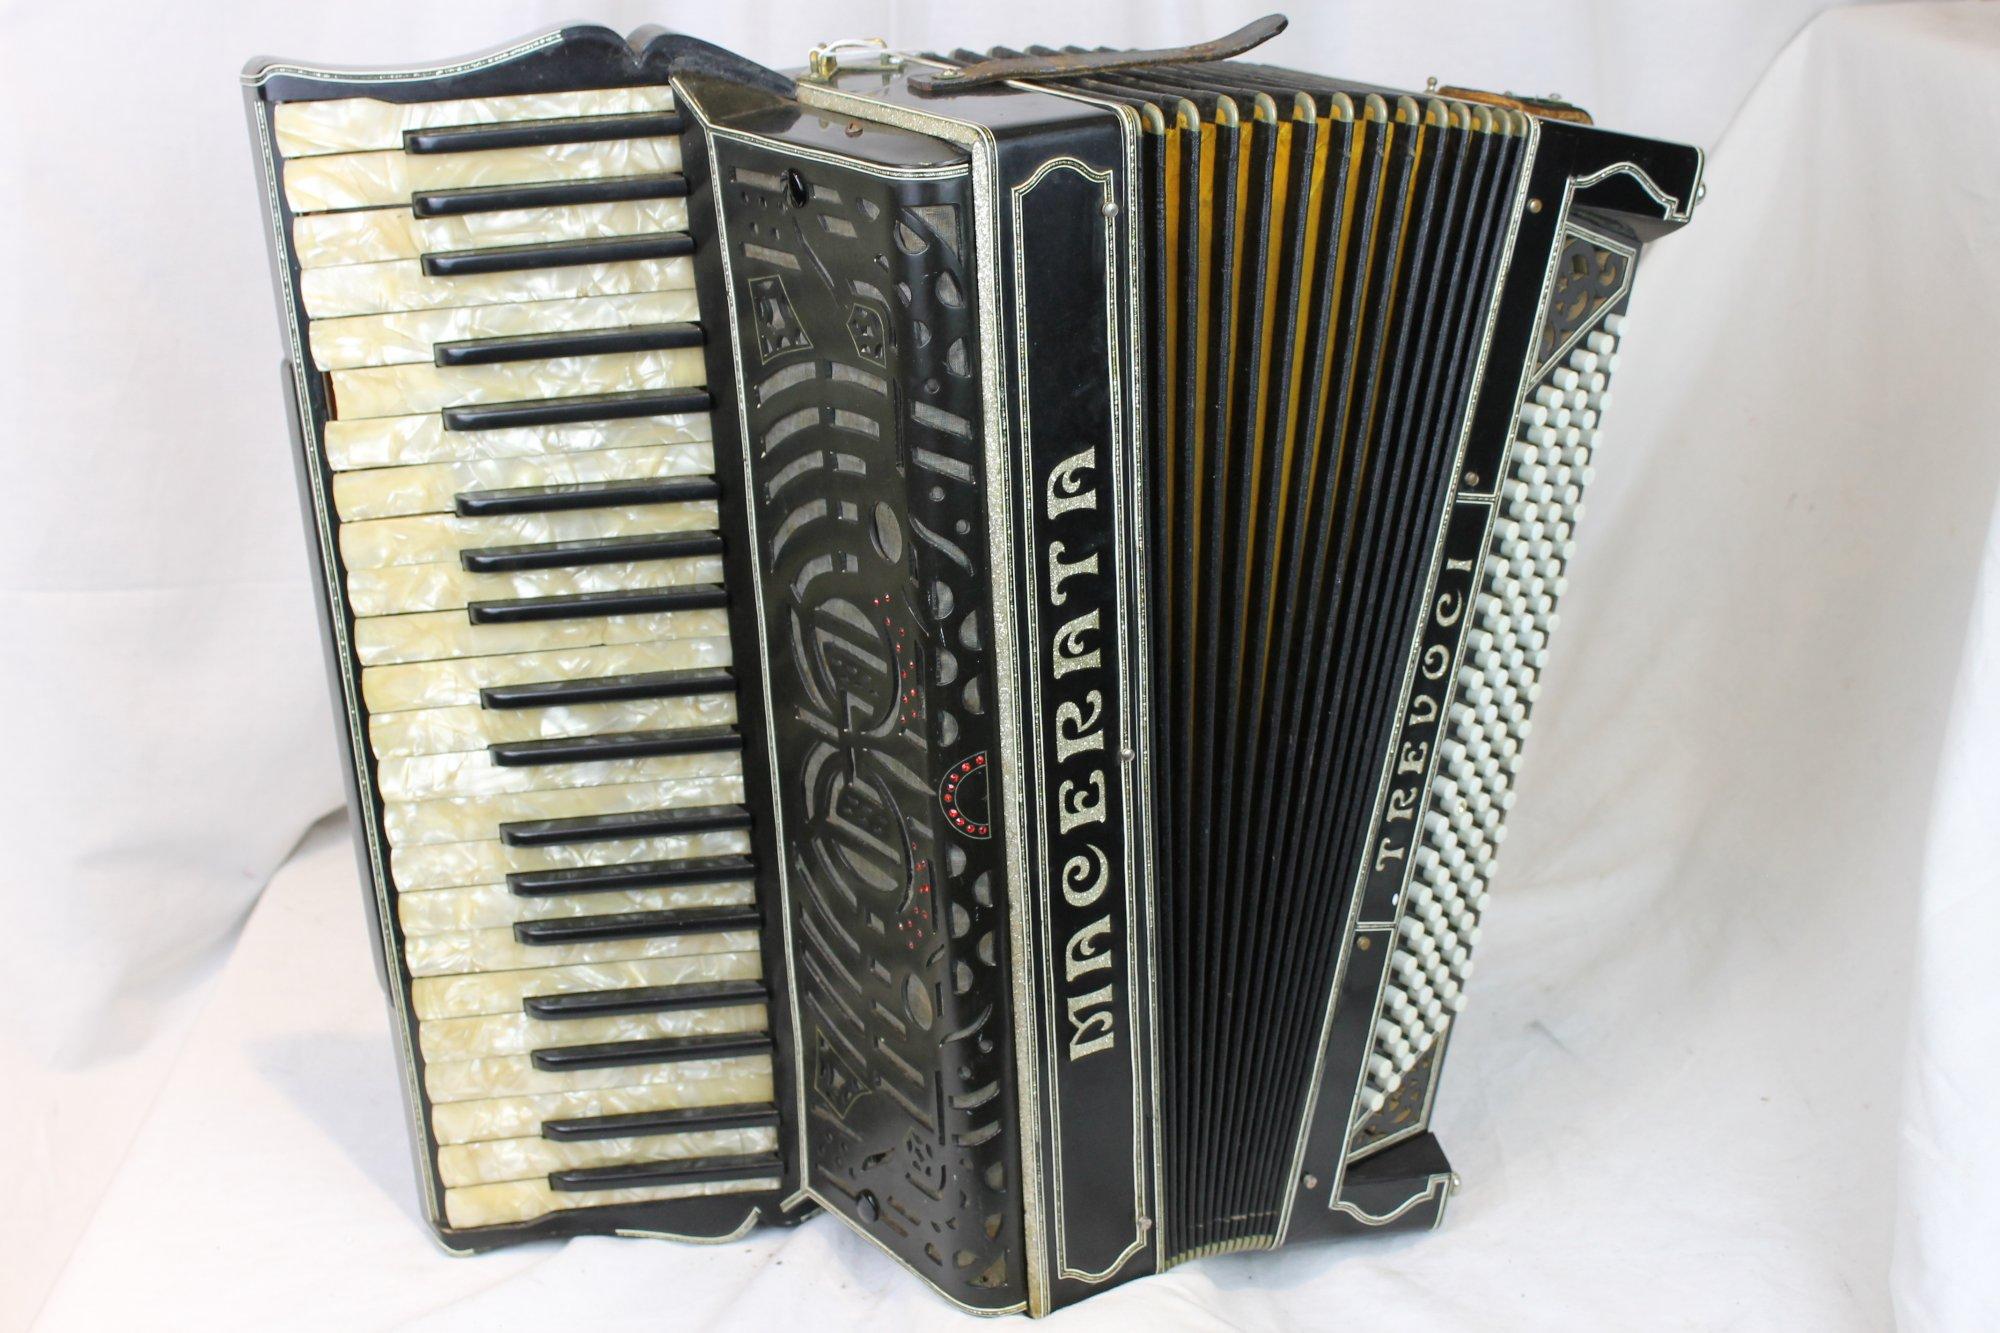 3238 - Black Macerata Piano Accordion LMM 41 120 - For Parts or Repair